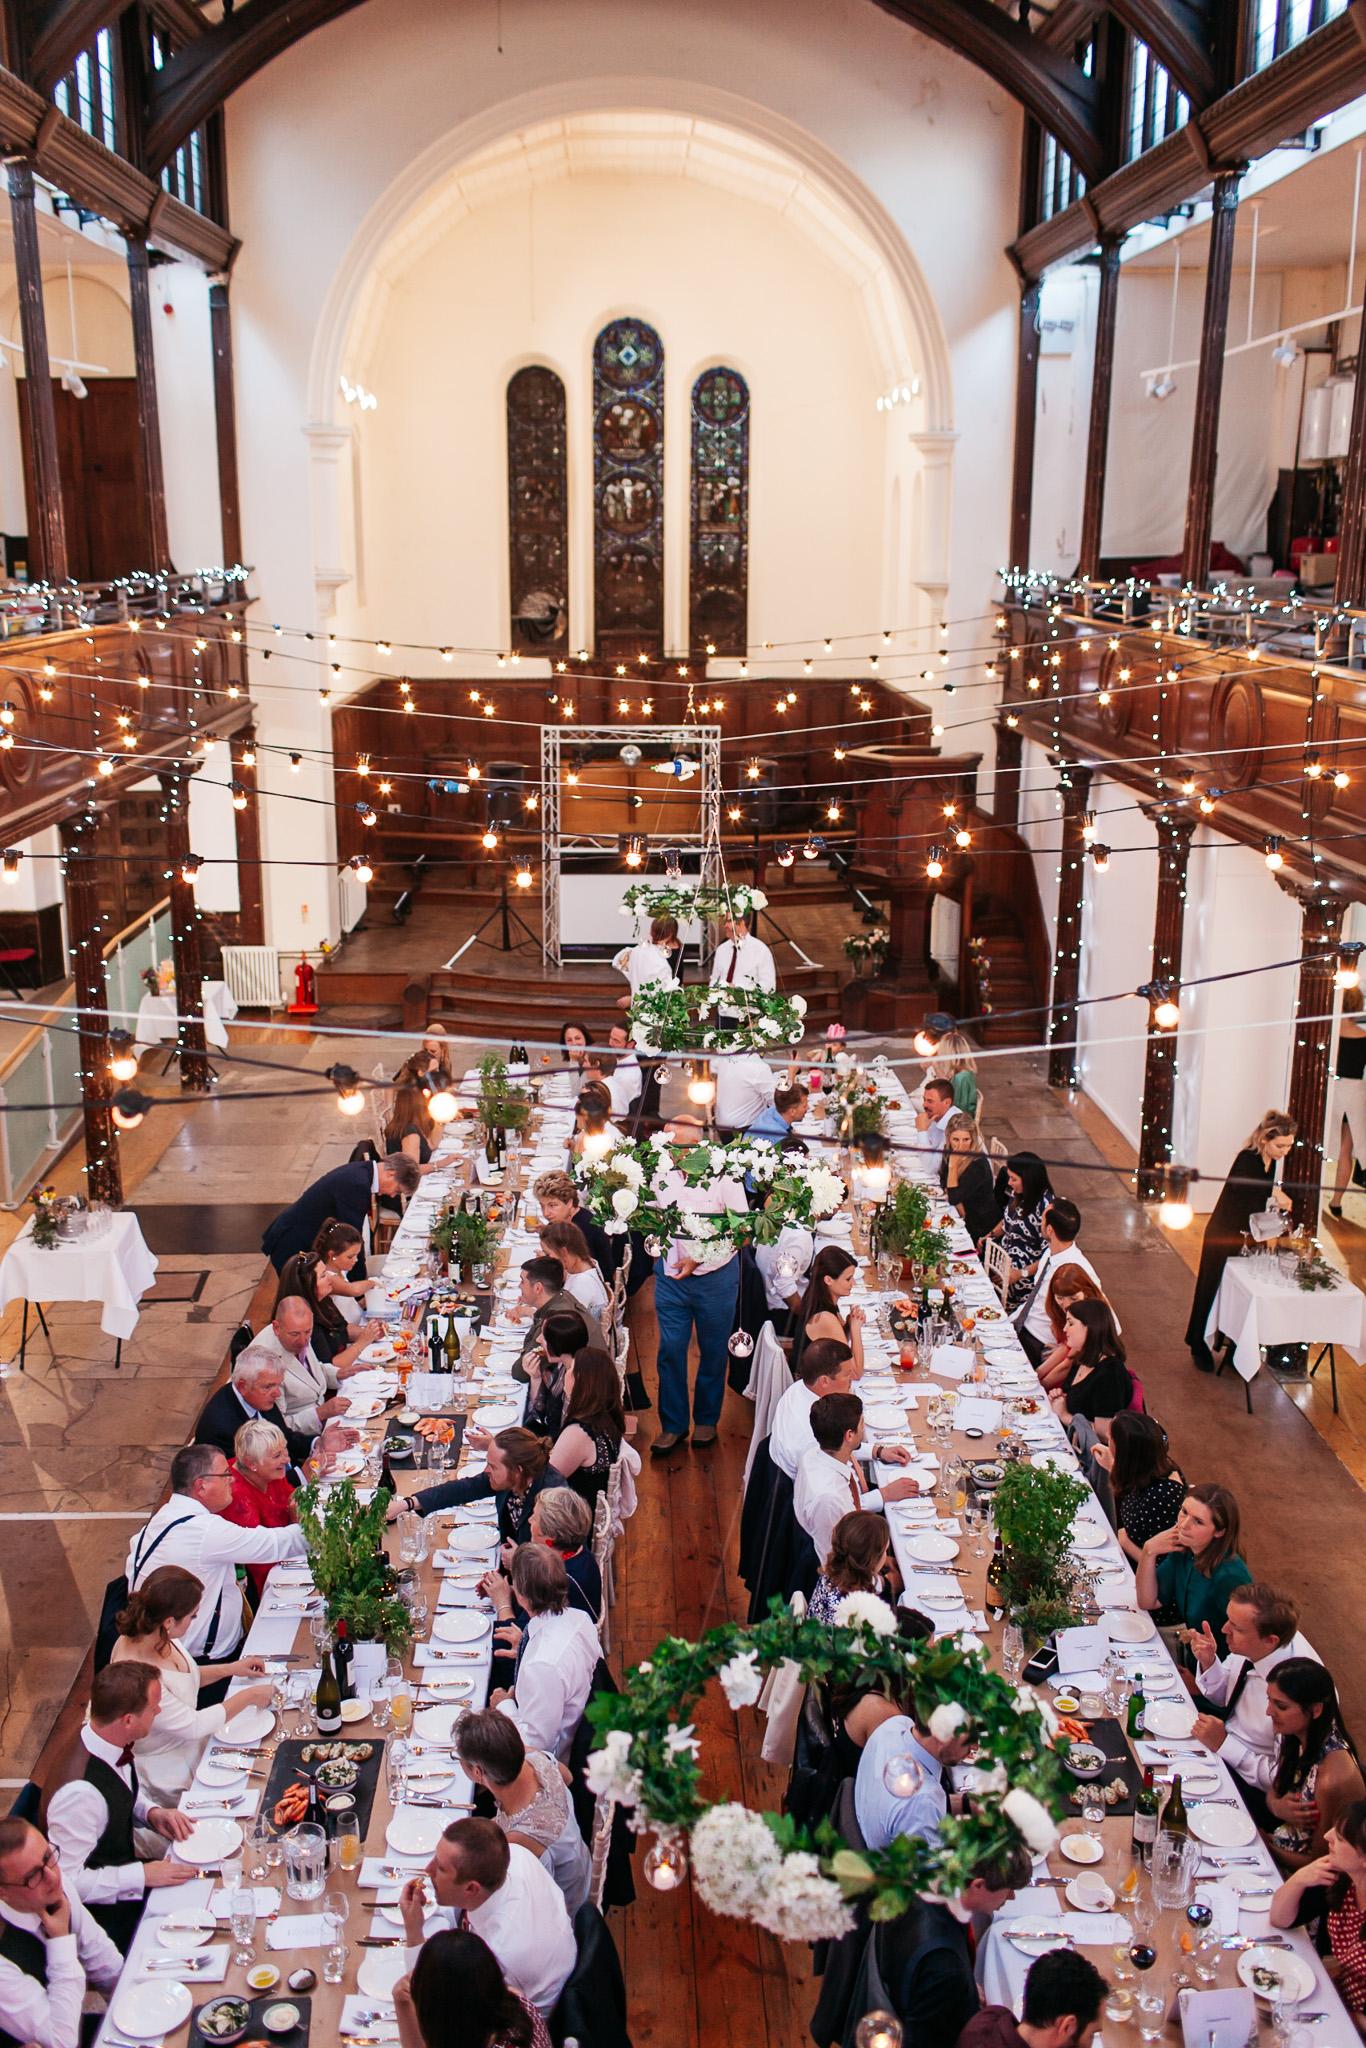 st_andrews_fabrica_brighton_wedding_611.jpg